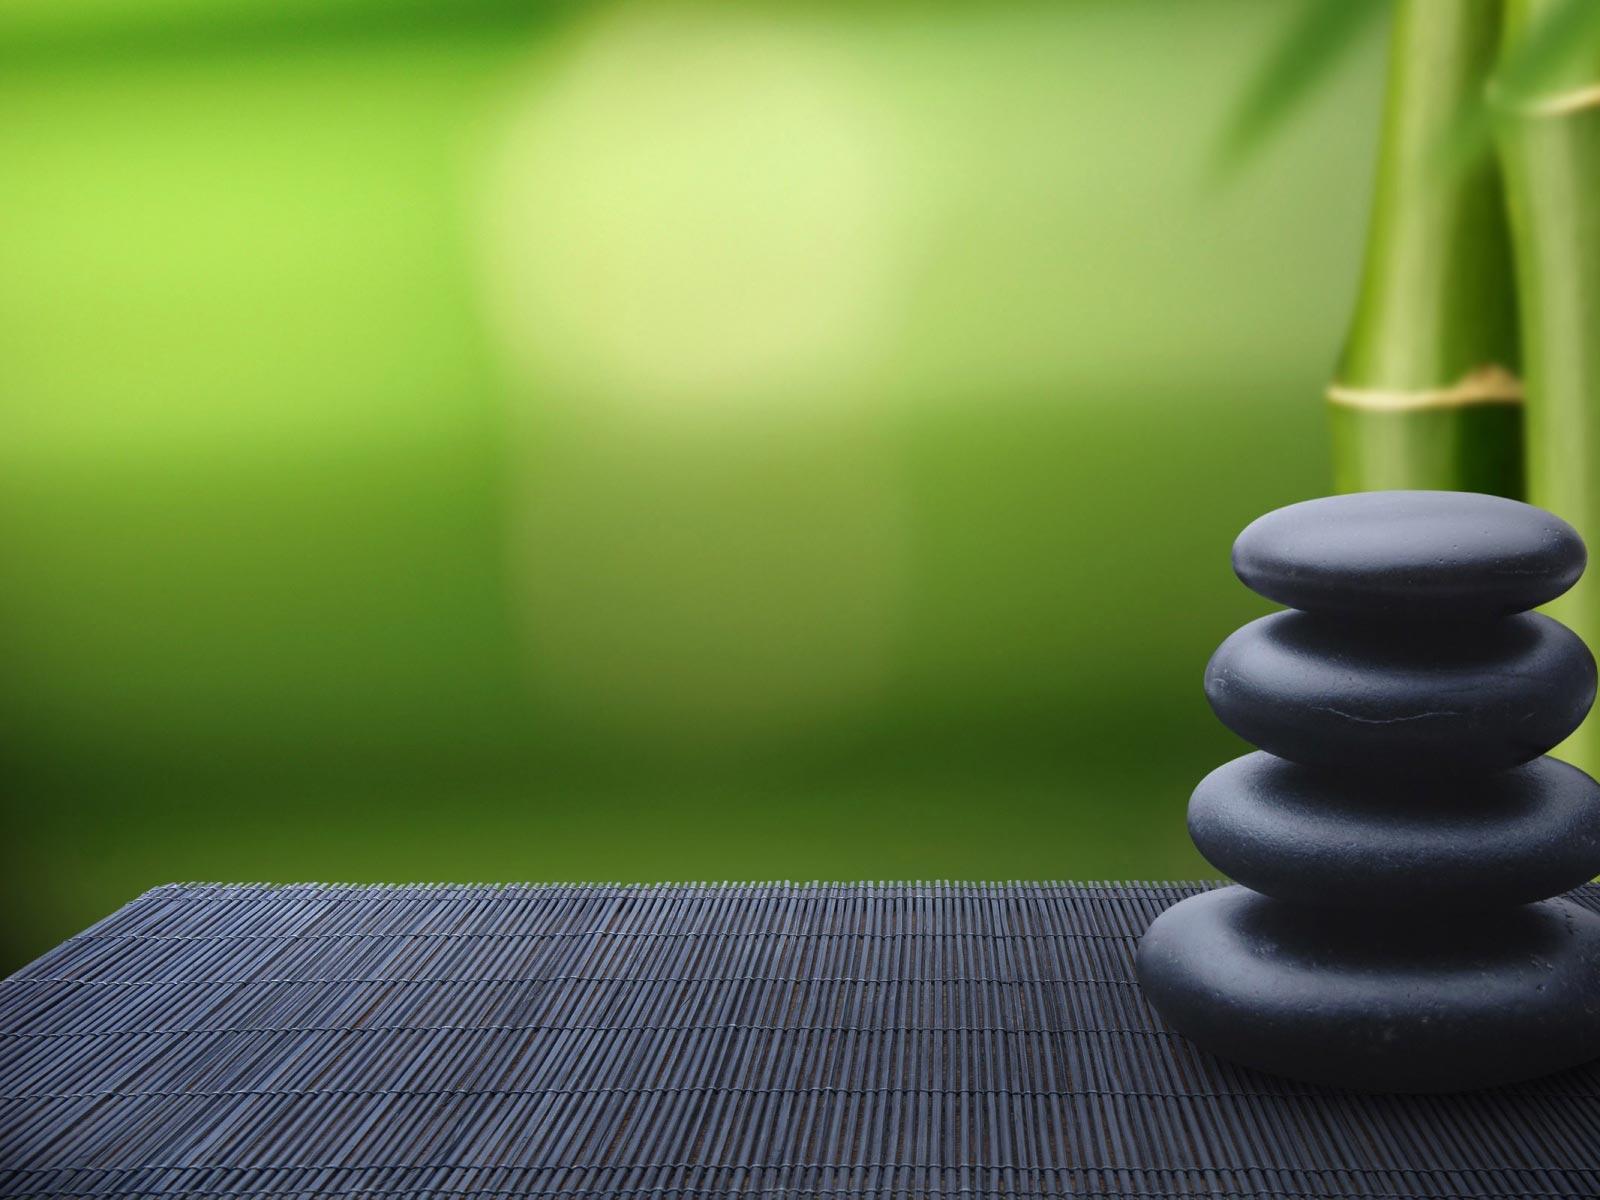 49 Zen Meditation Wallpaper On Wallpapersafari